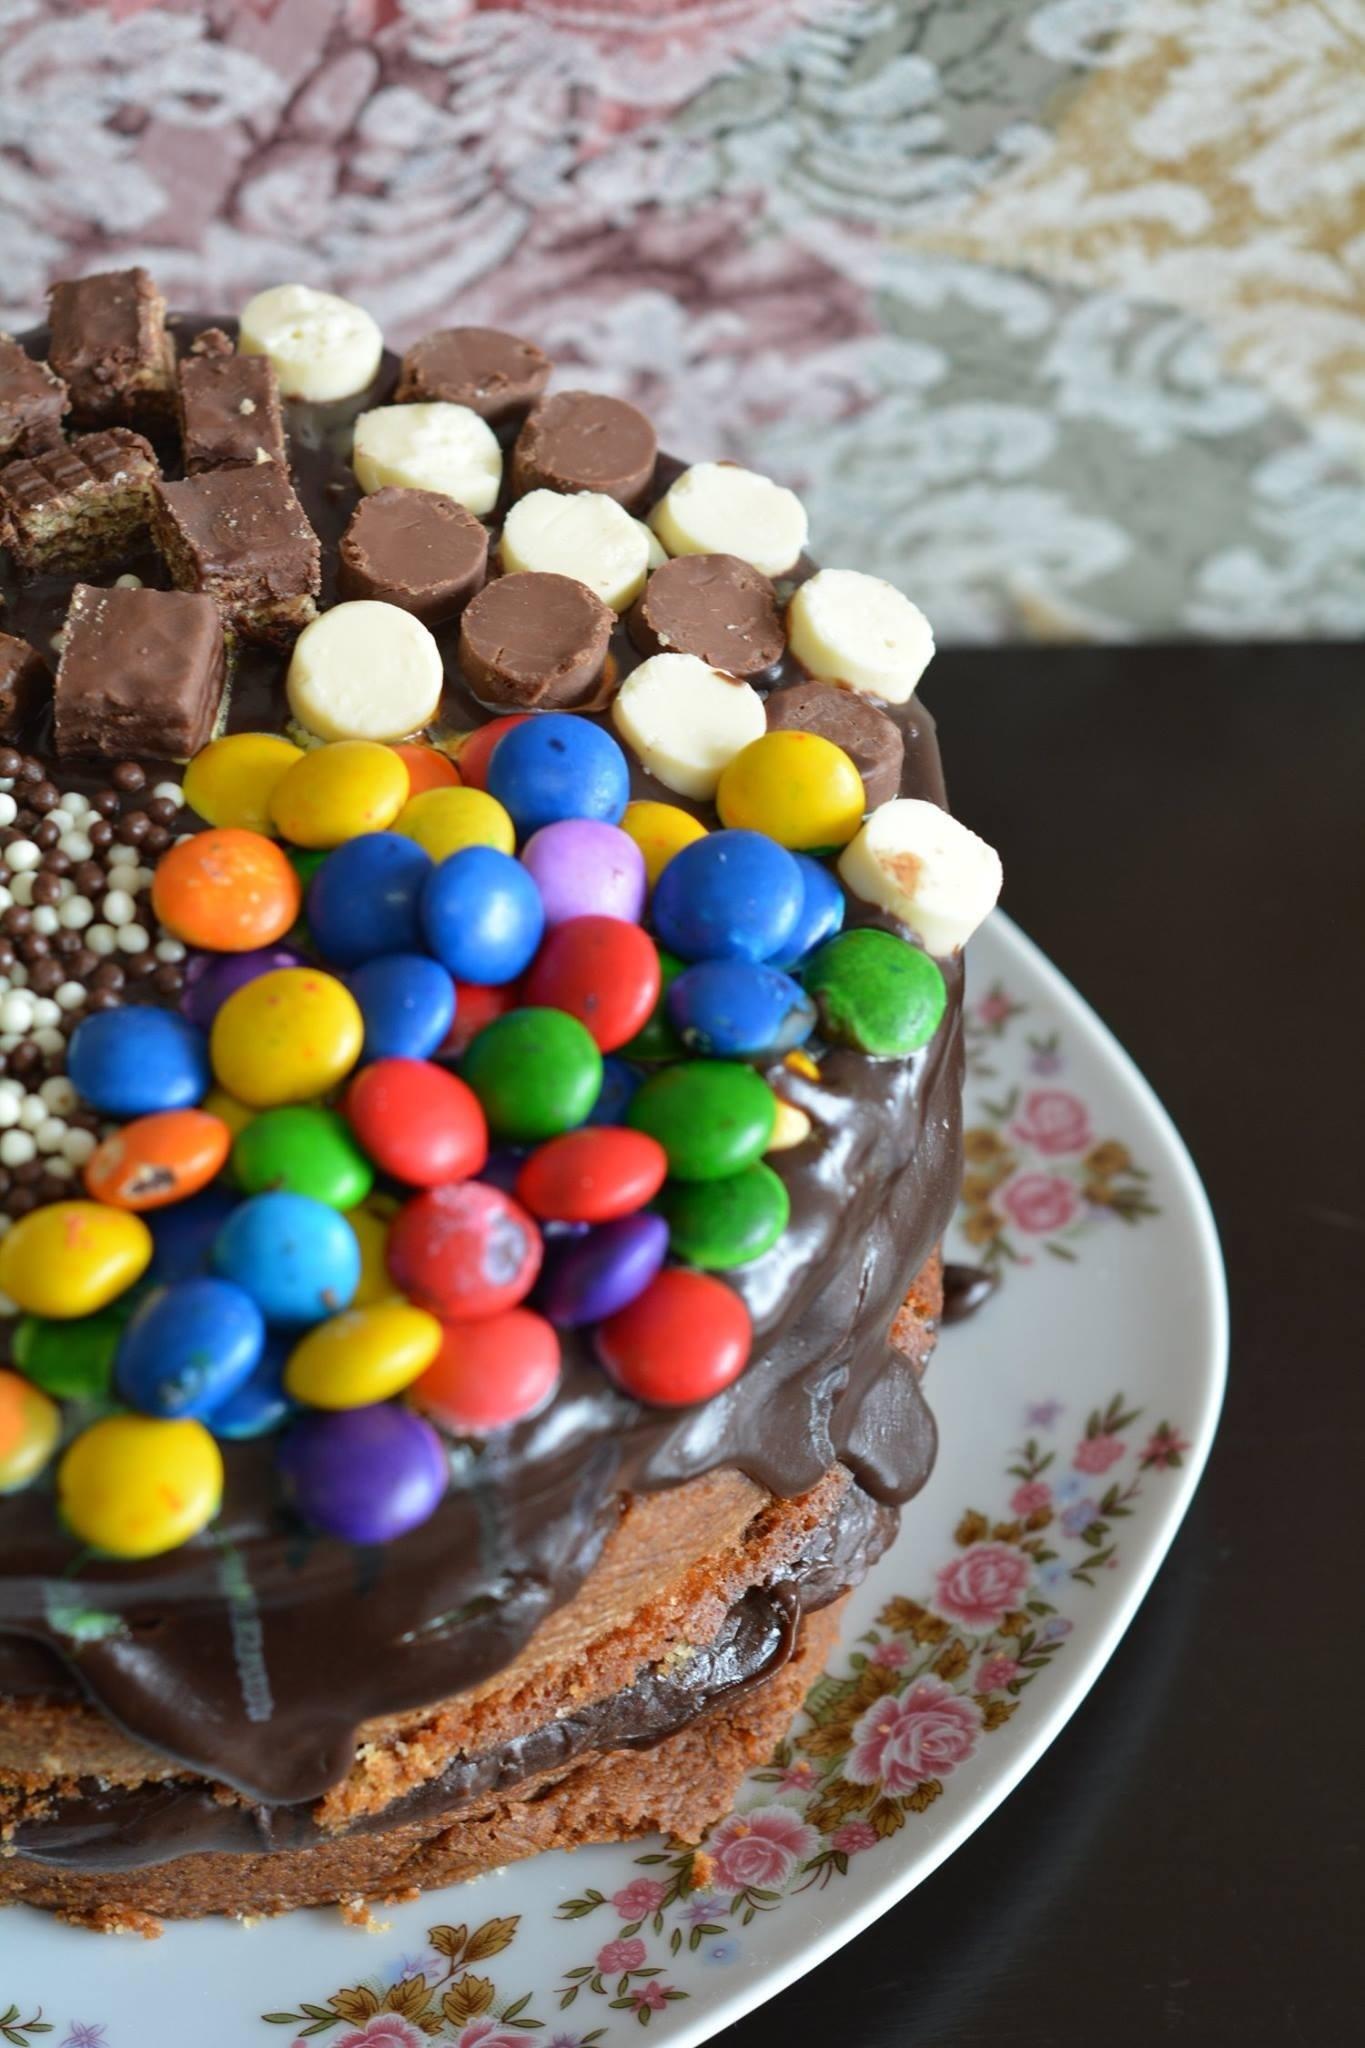 Free Images : baking, dessert, birthday cake, chocolate cake